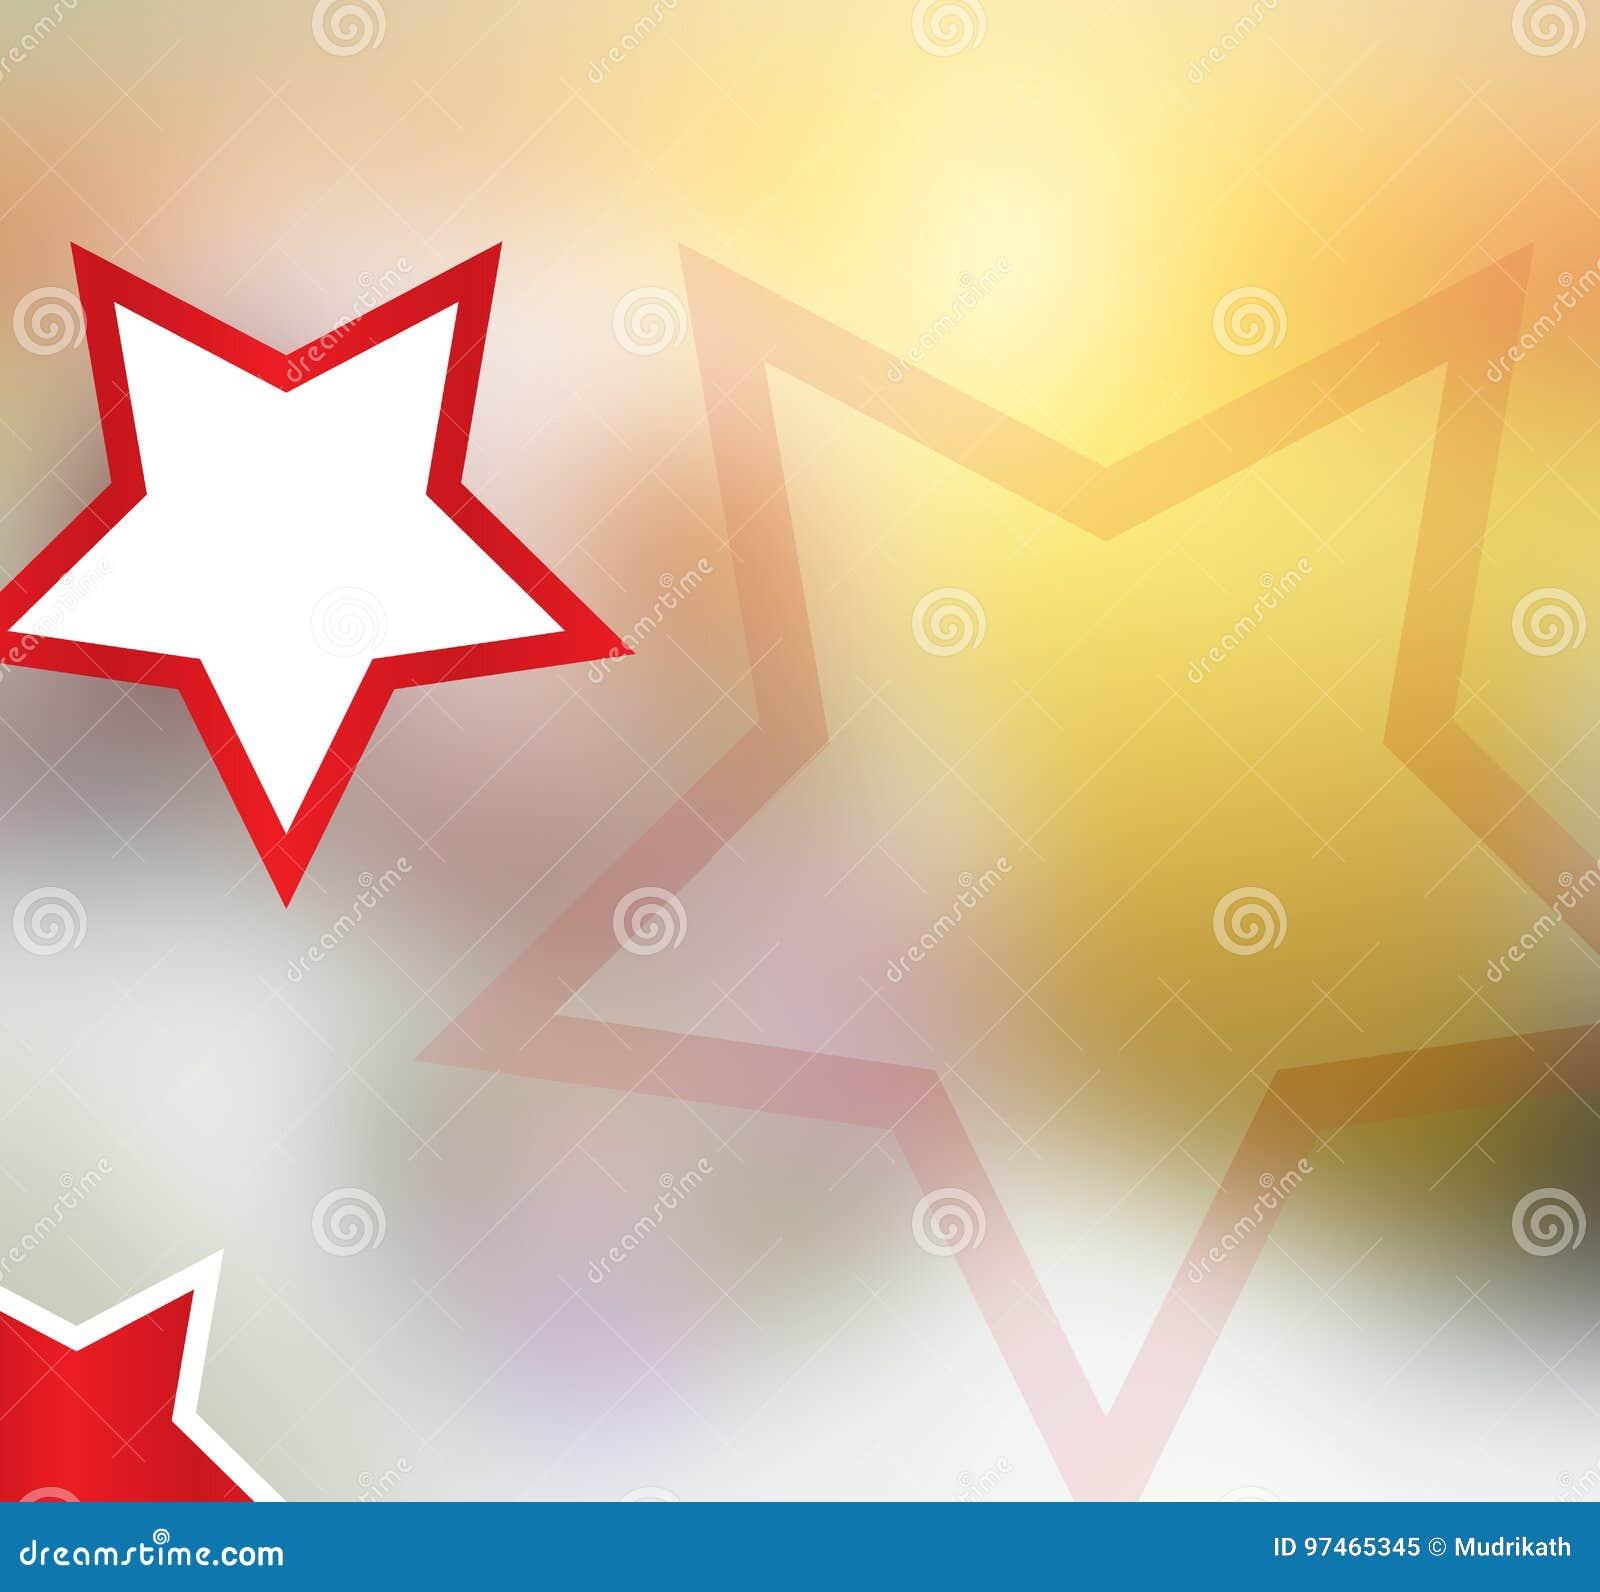 Shining Star Kids Background Abstract 21 July 2017 Stock Illustration Illustration Of July Border 97465345